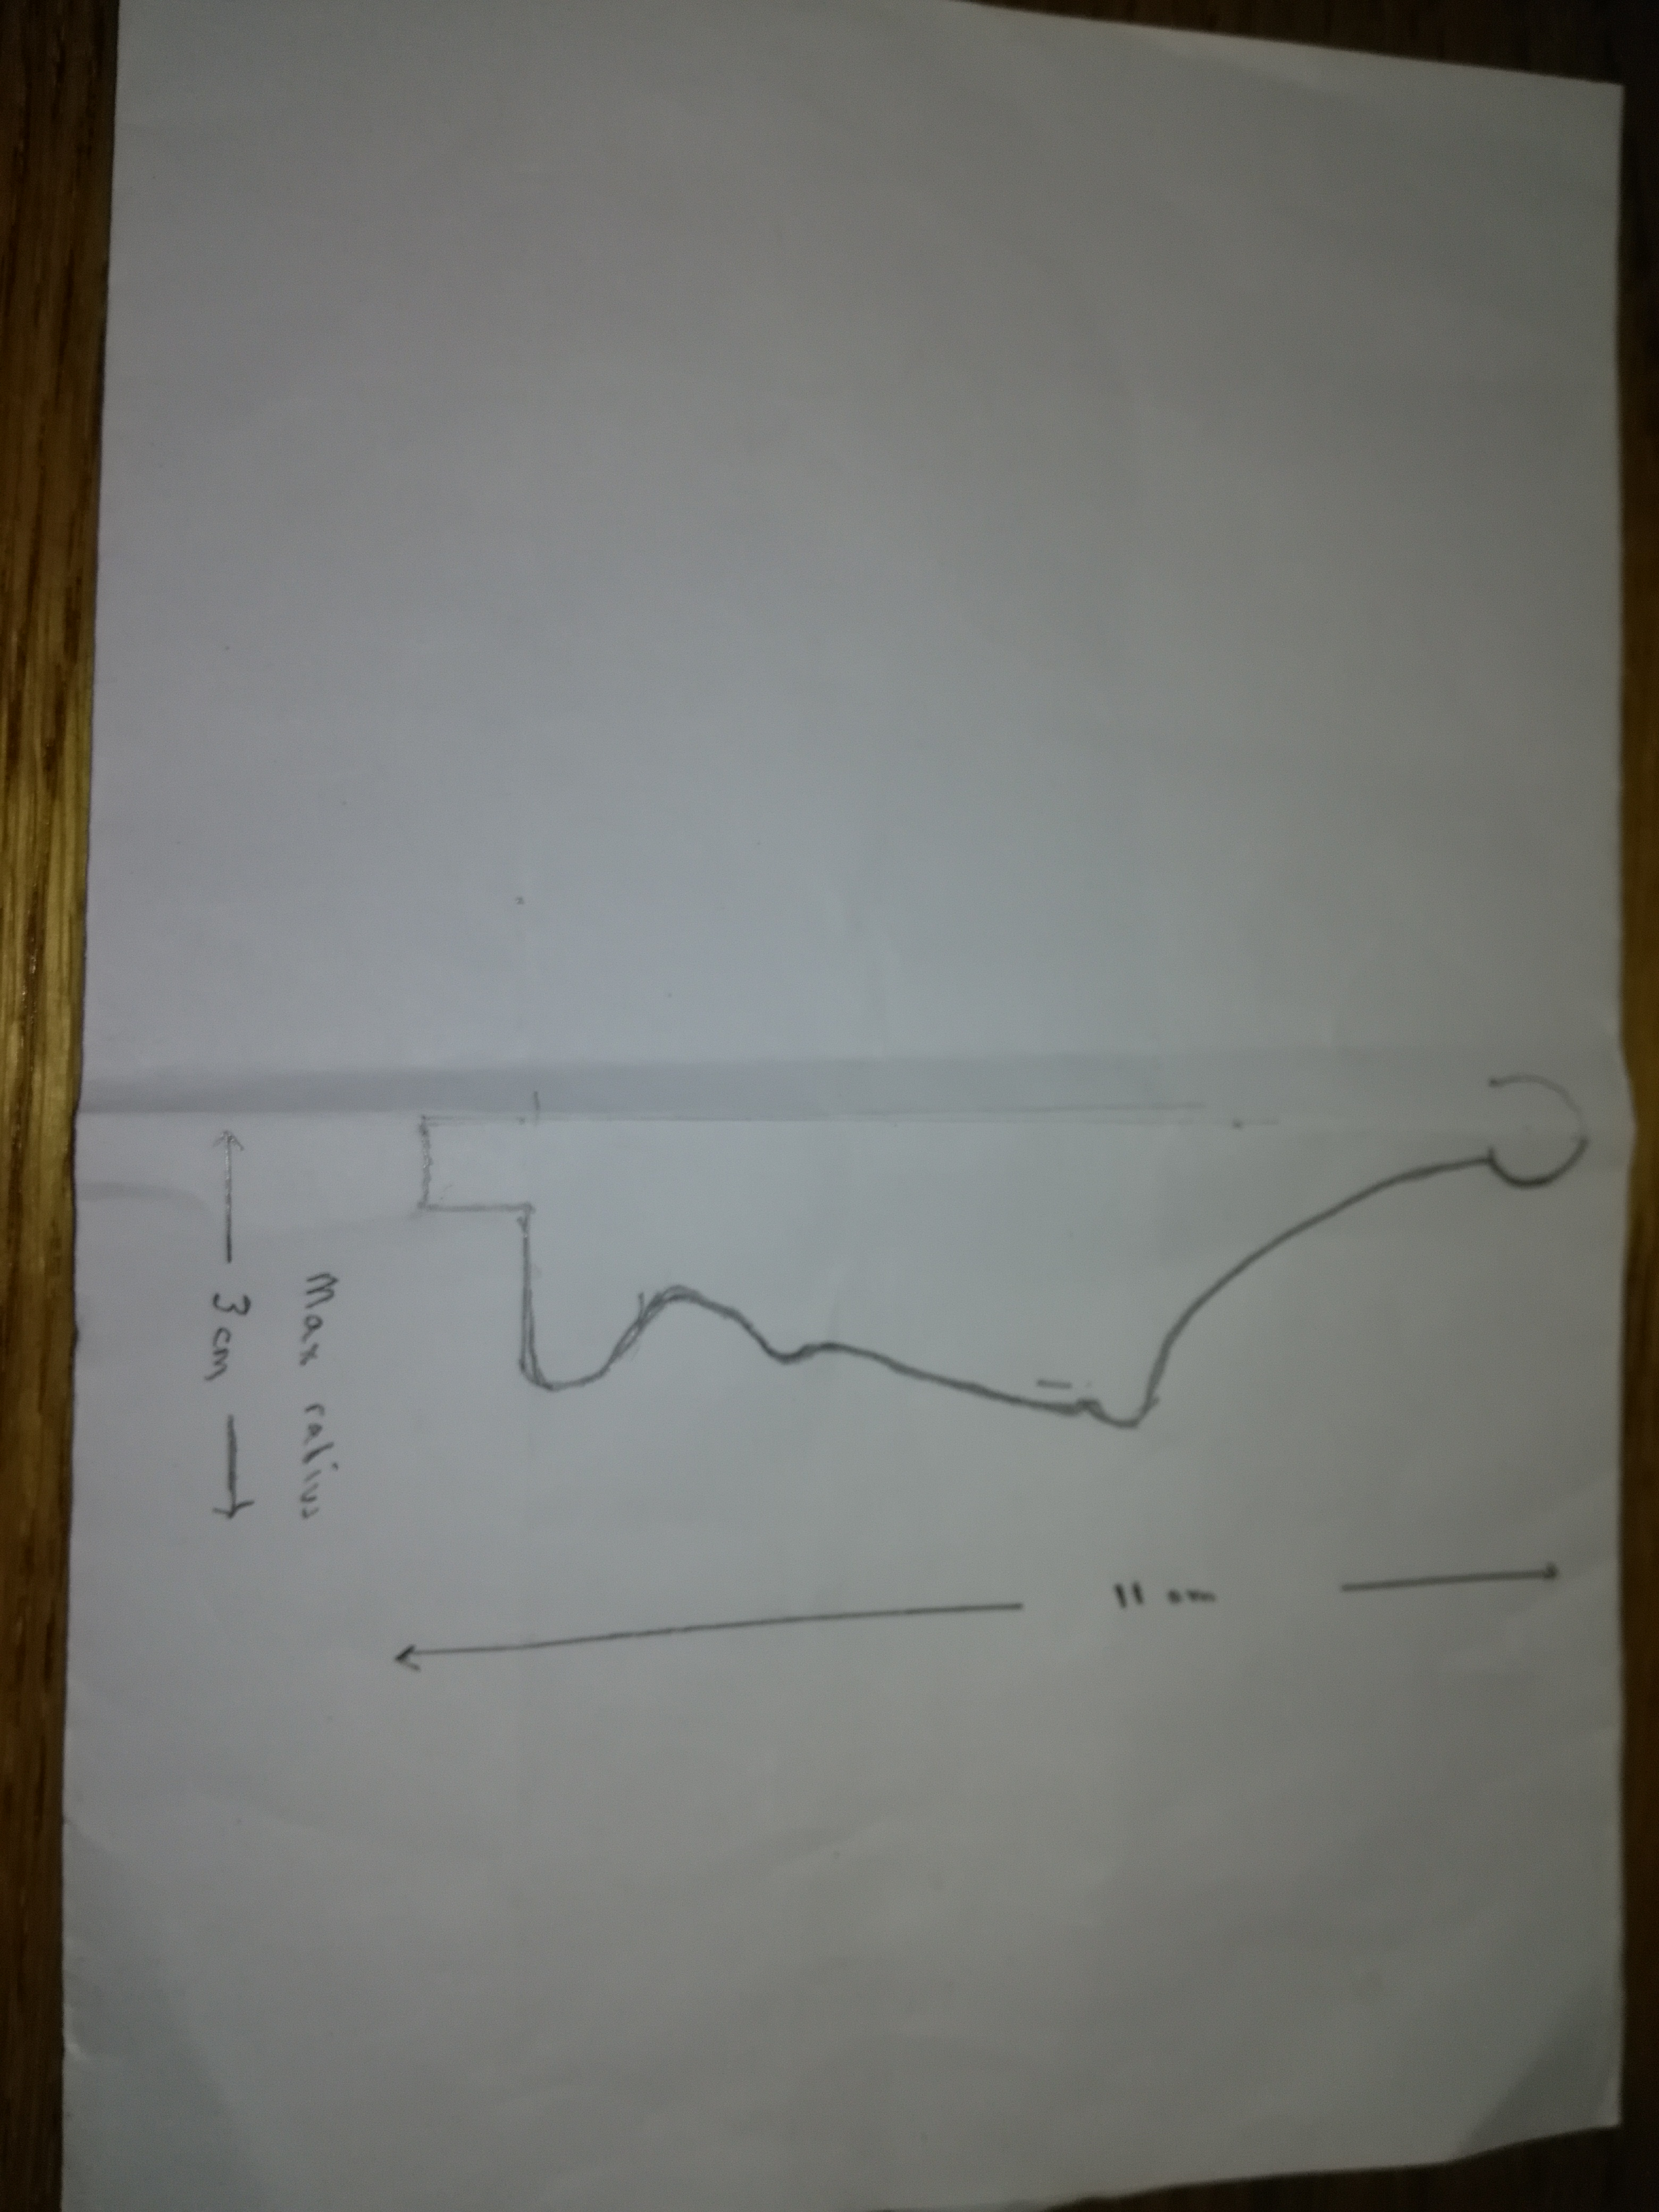 make a diagram